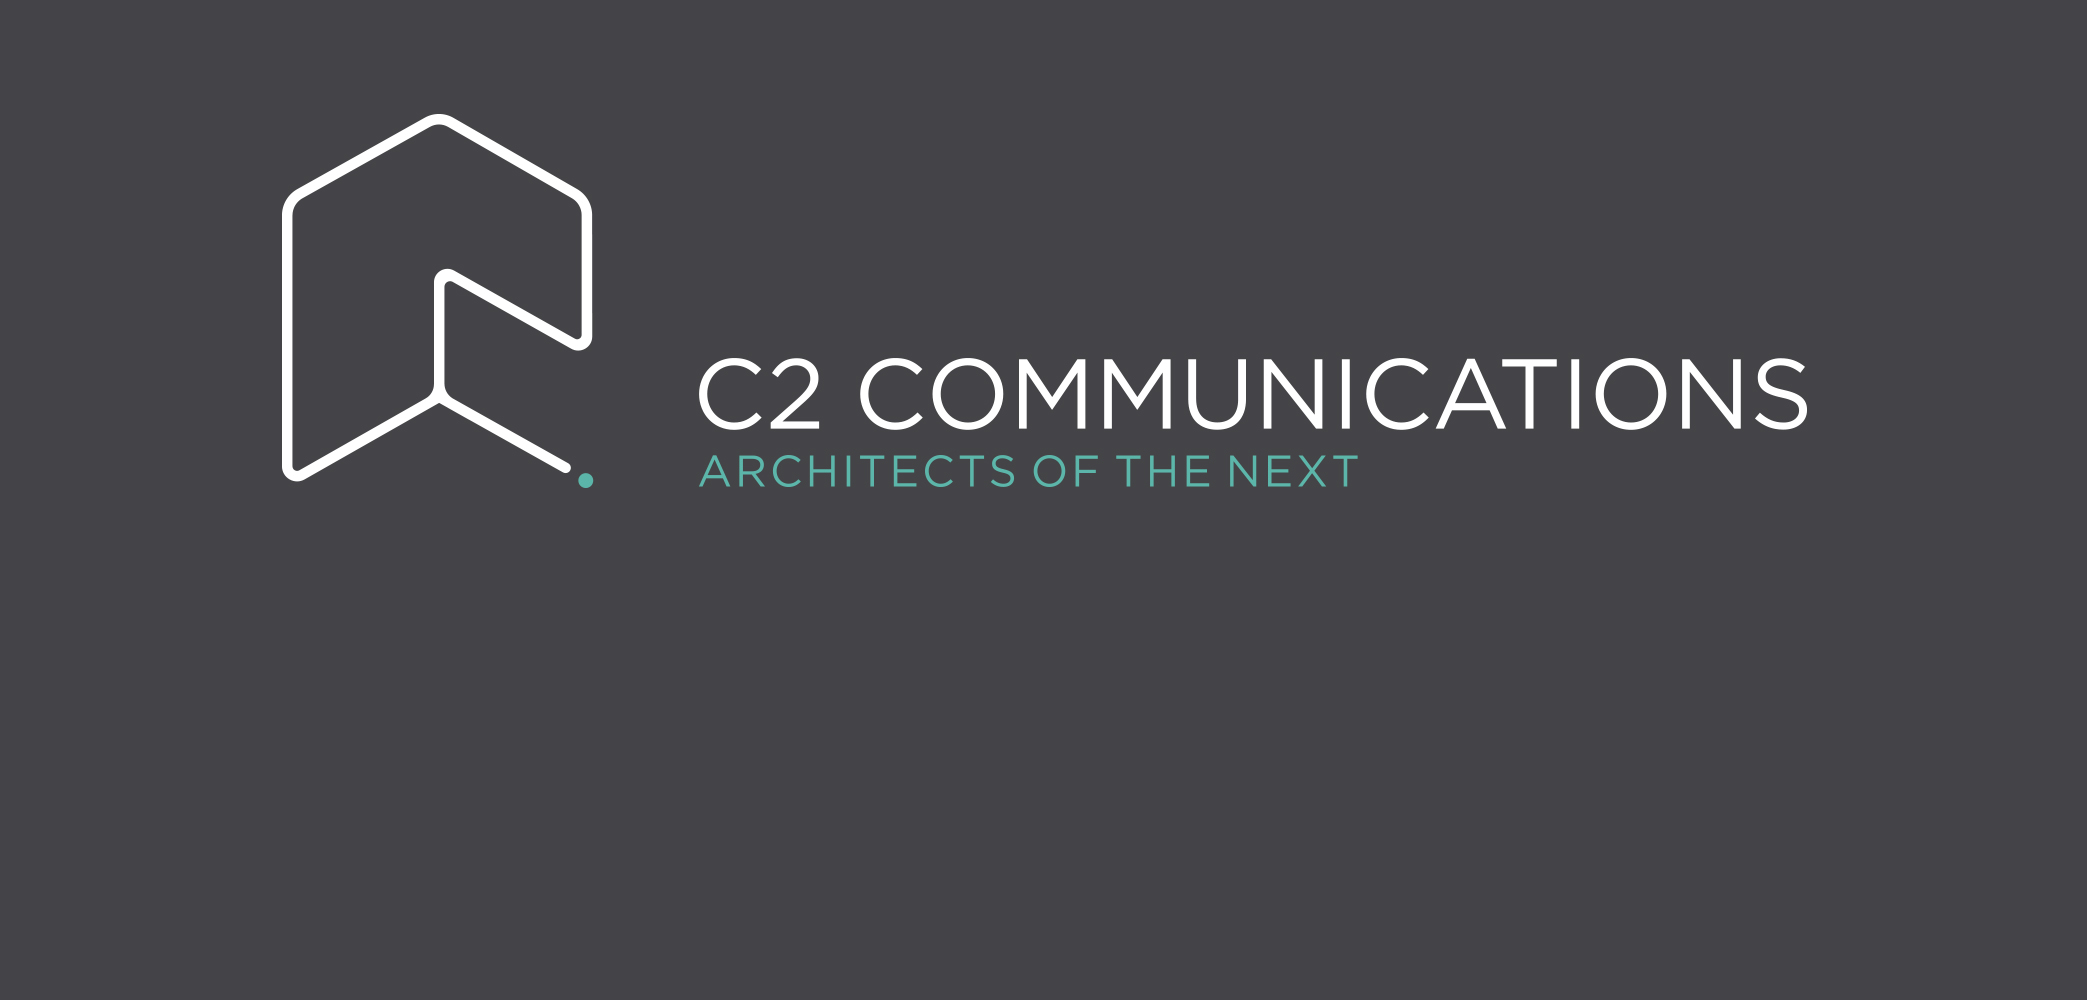 behind-the-rebranding-c2-comms